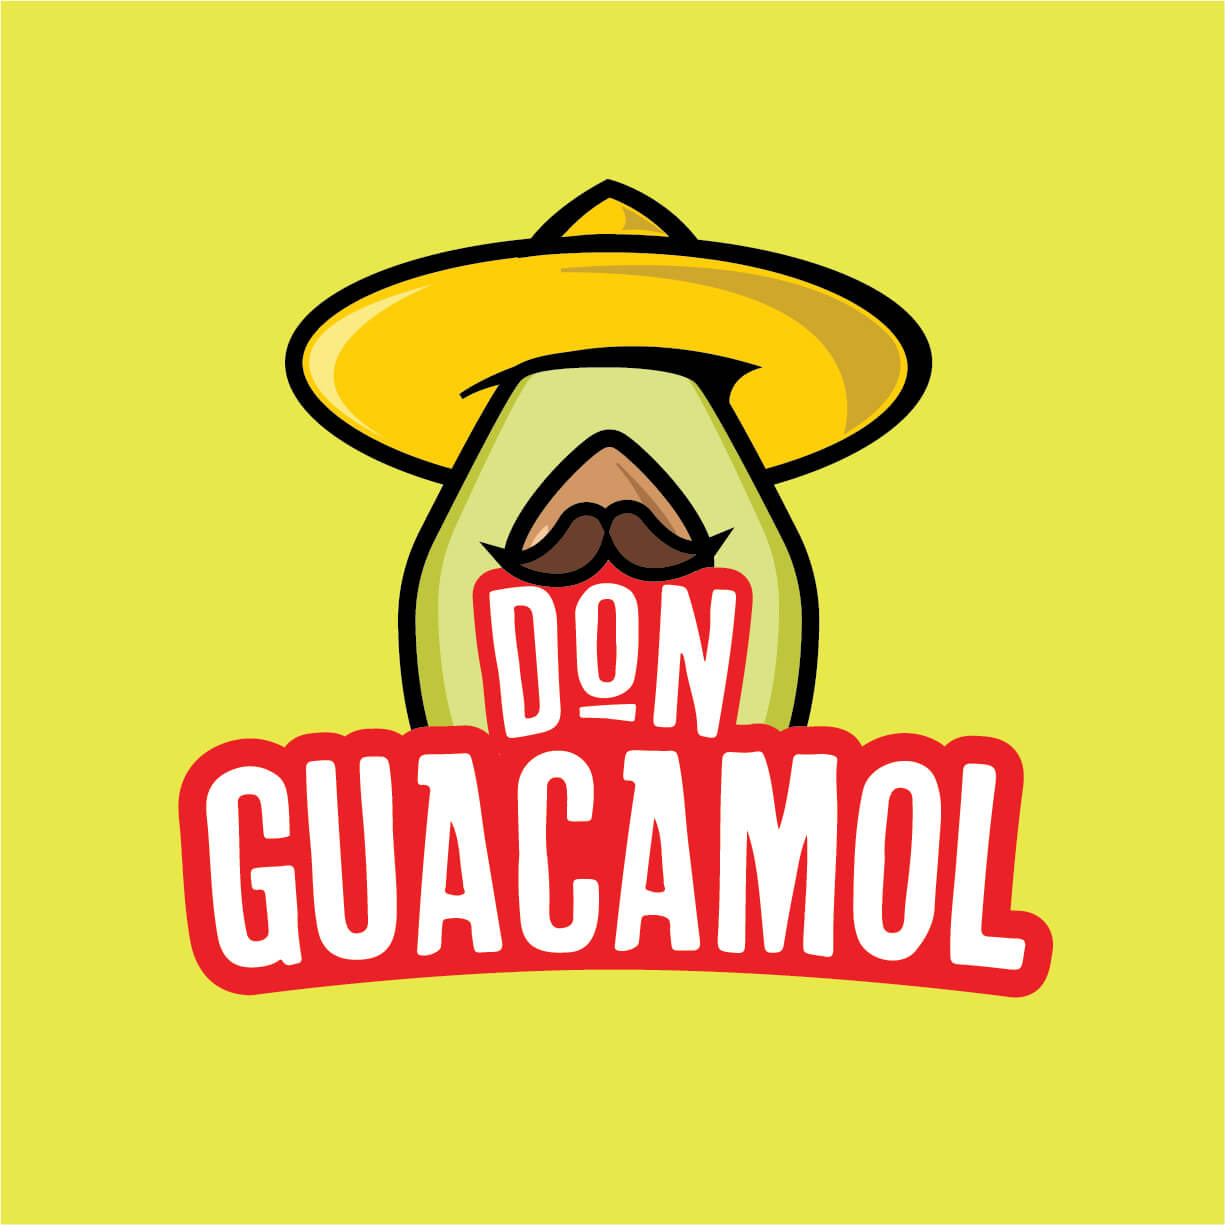 Don Guacamol